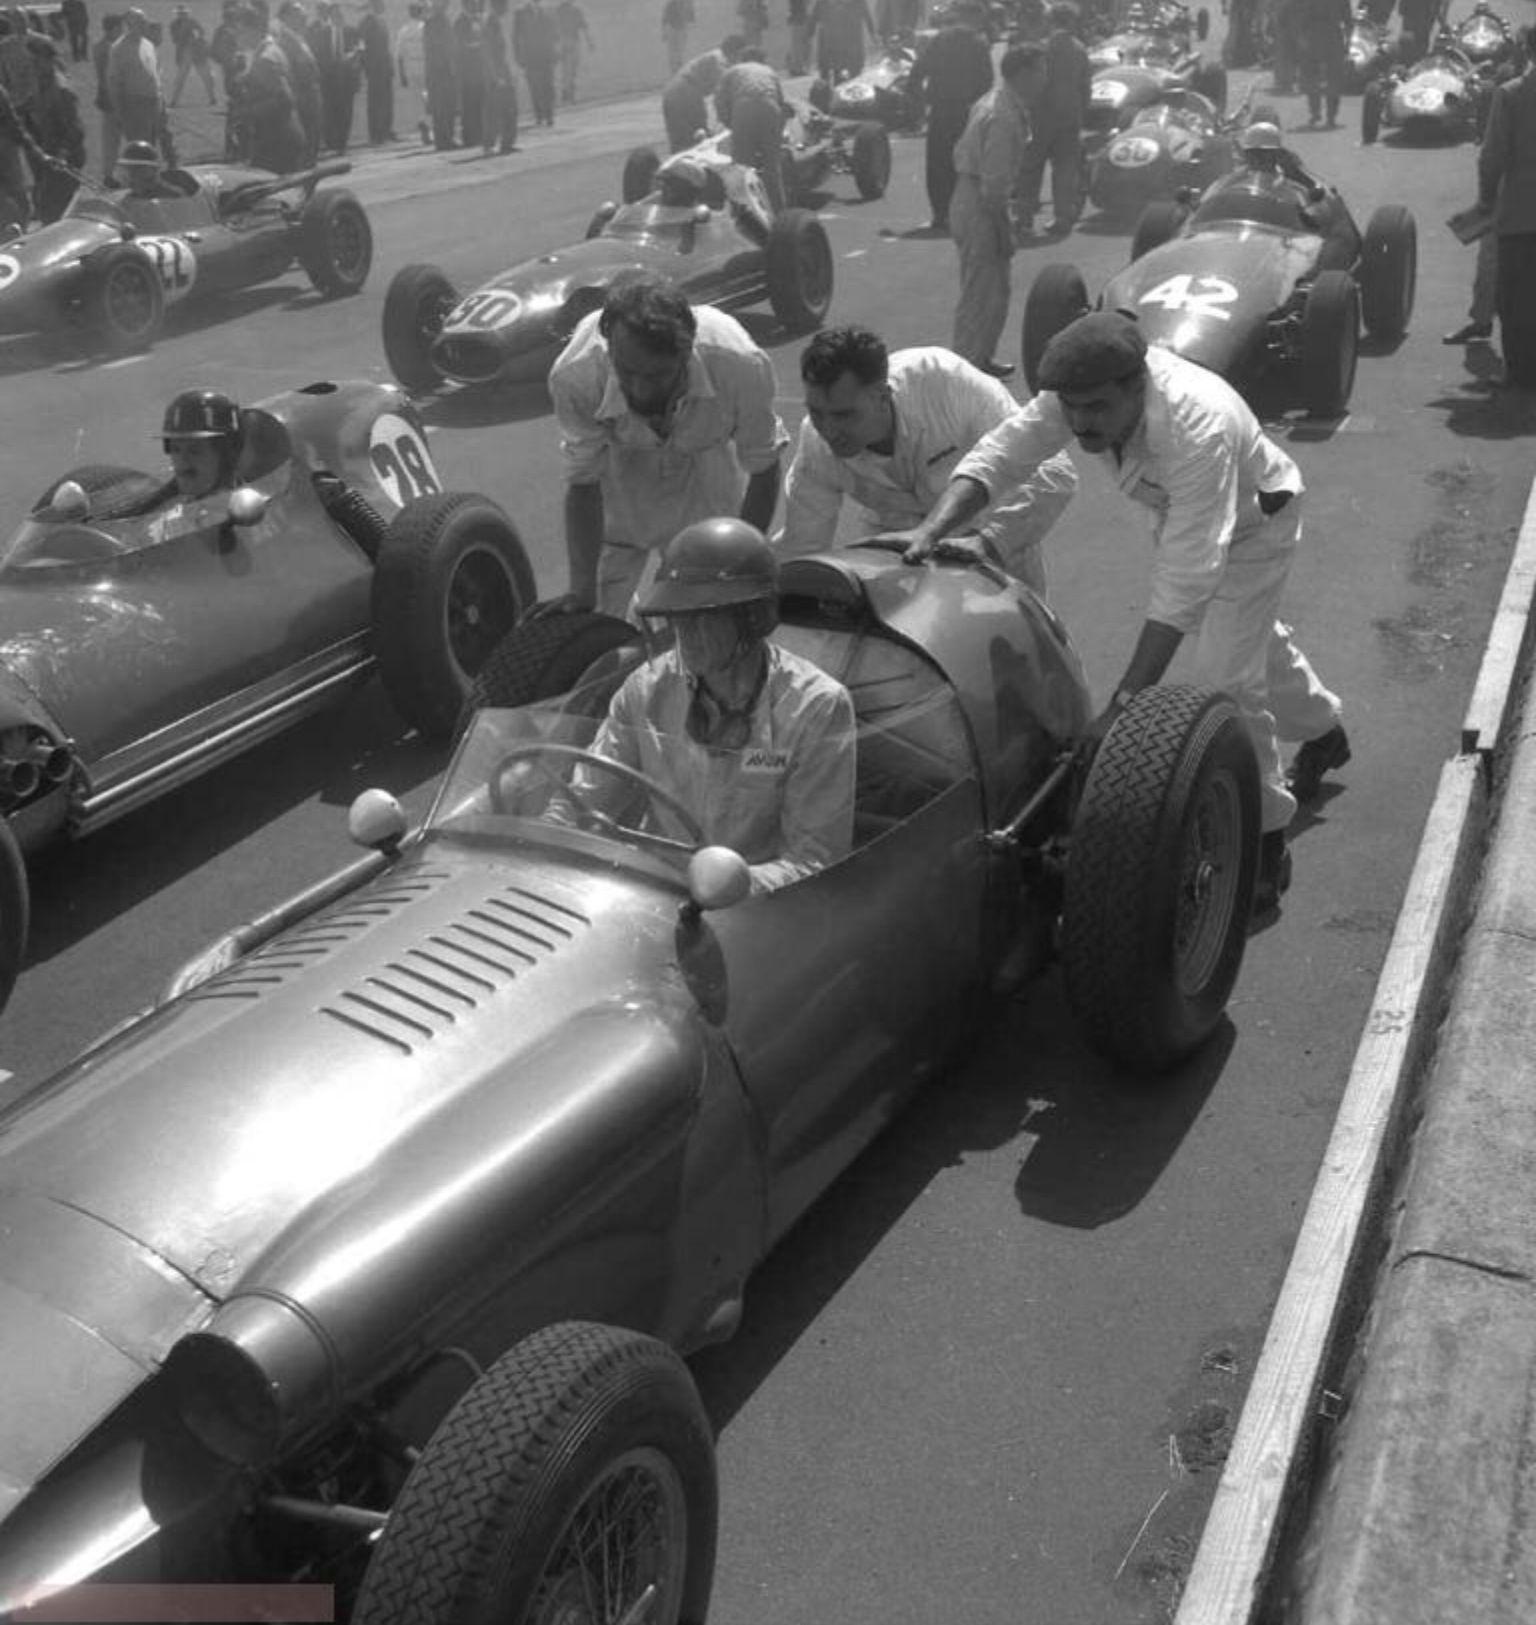 Carroll Shelby, Aston Martin DBR4, British GP Grid, G Hill